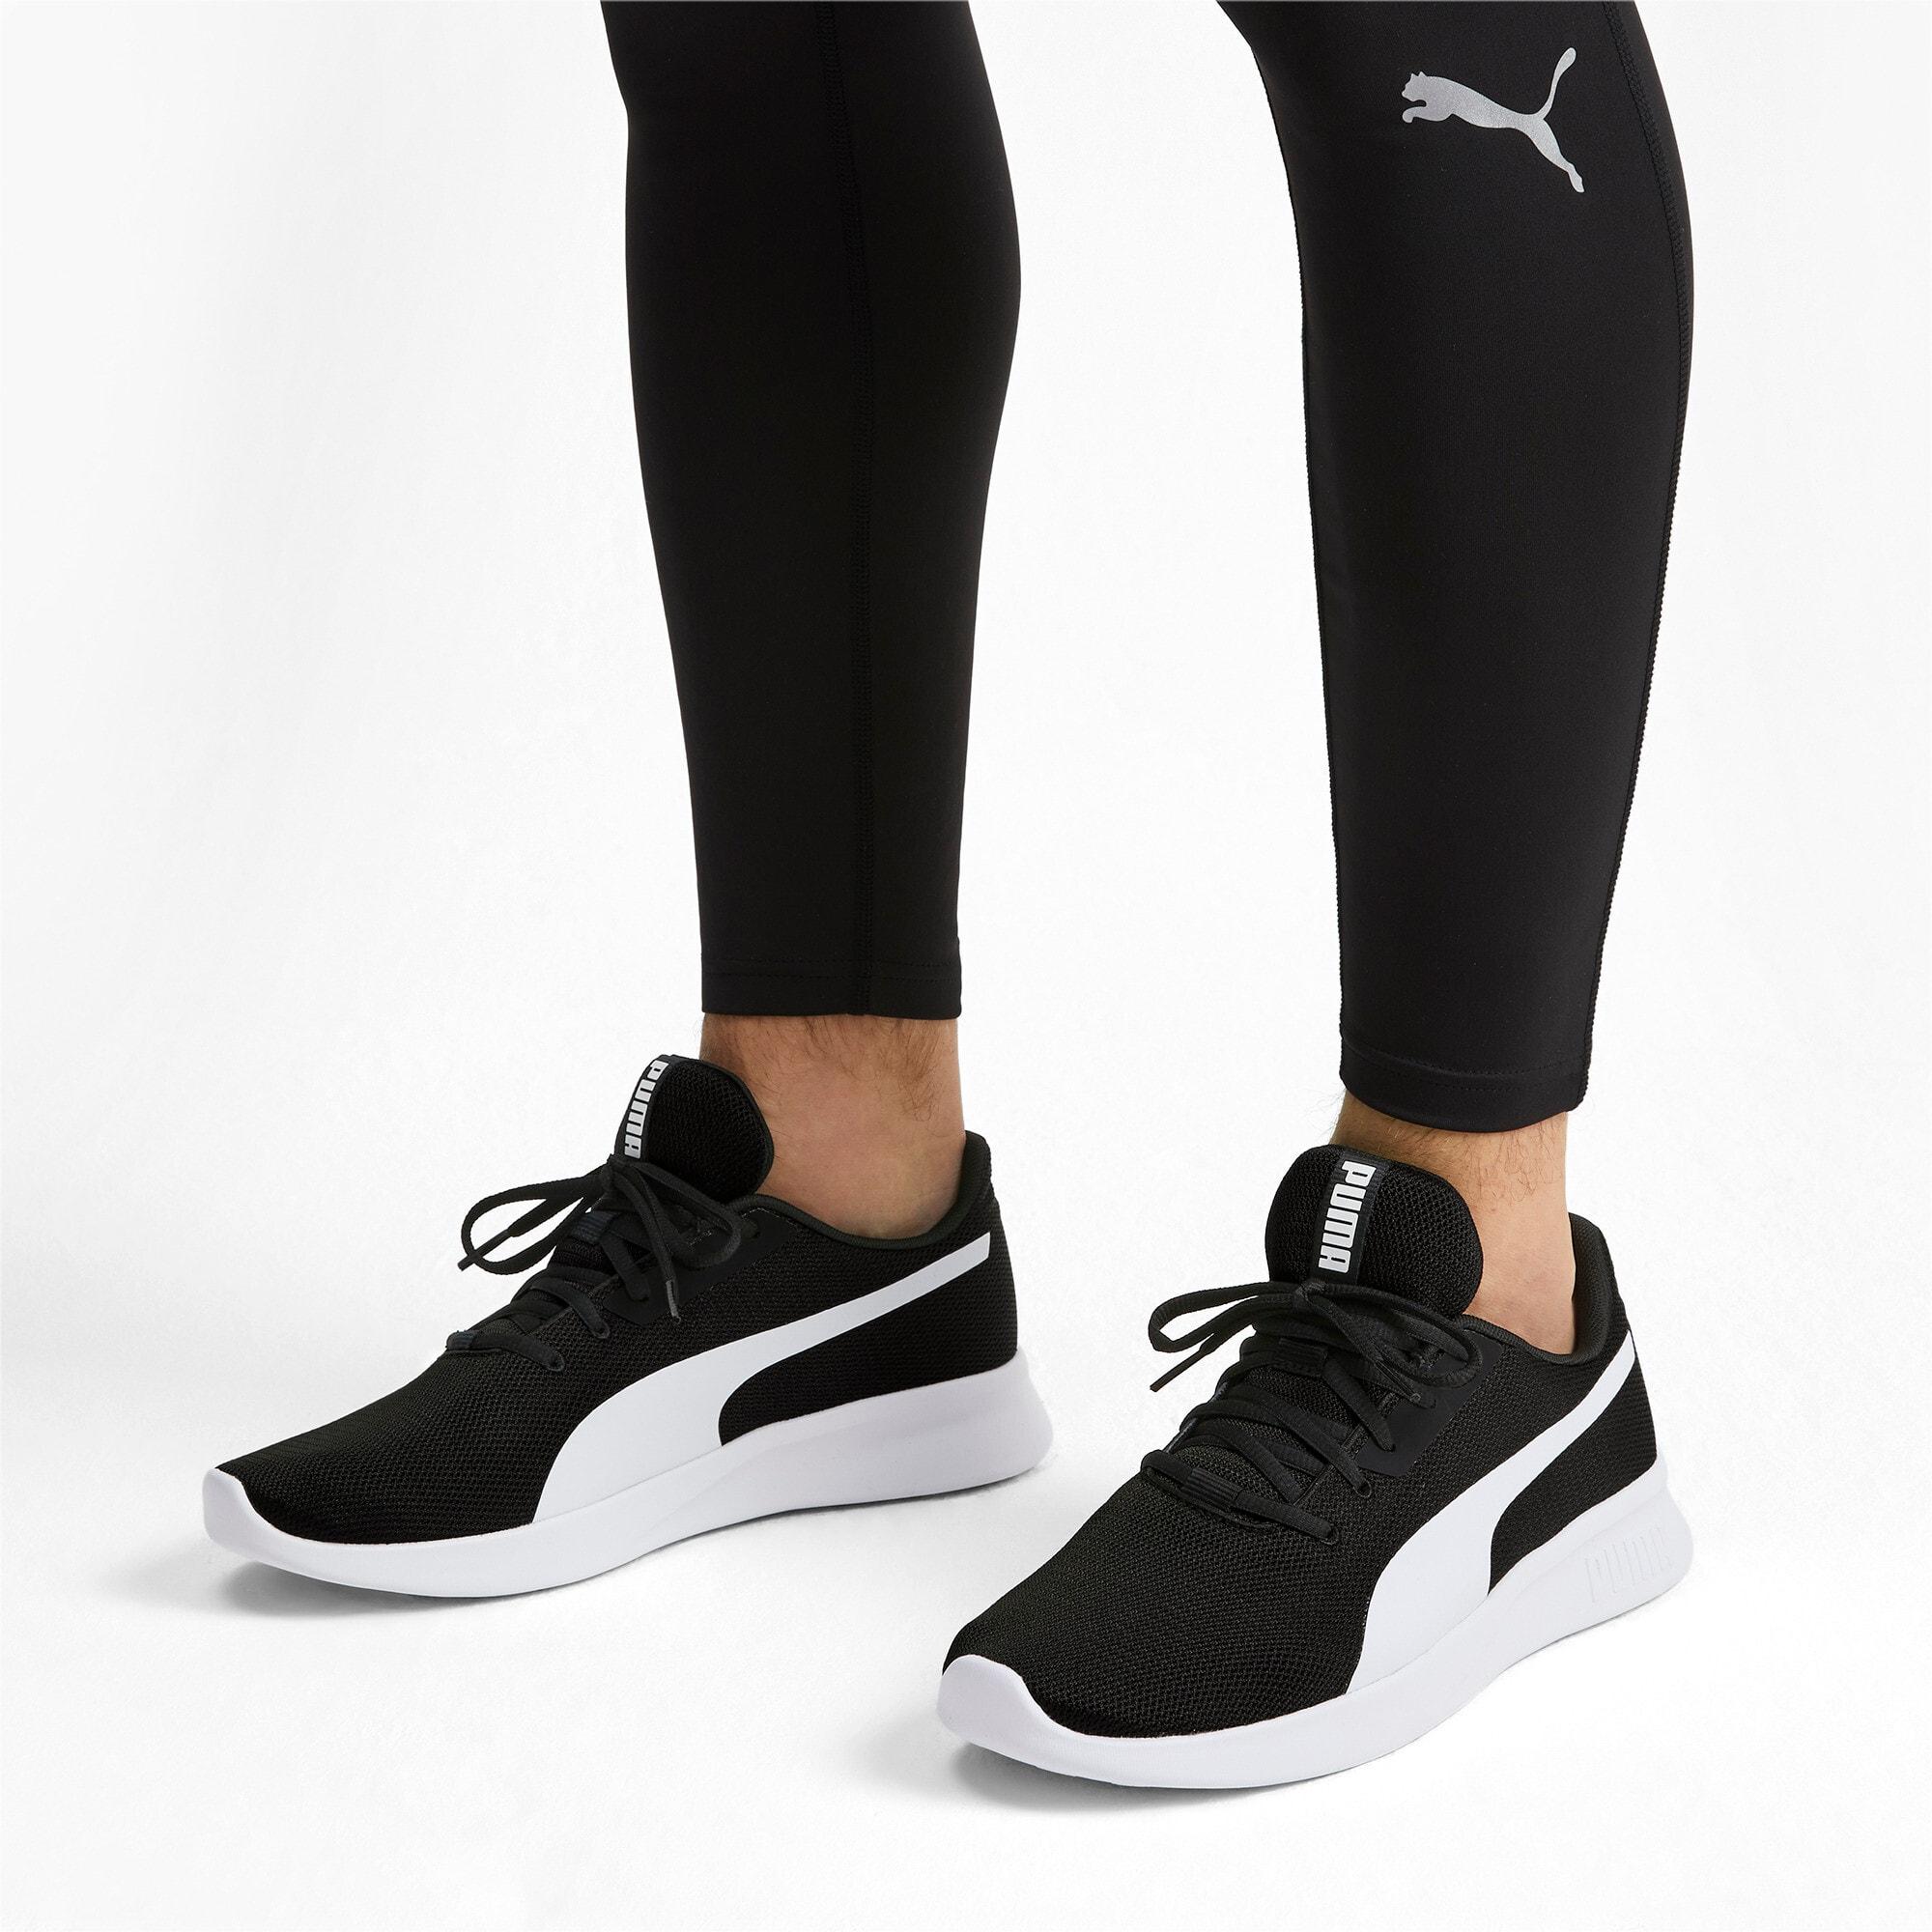 Thumbnail 2 of Modern Runner Sneakers, Puma Black-Puma White, medium-IND